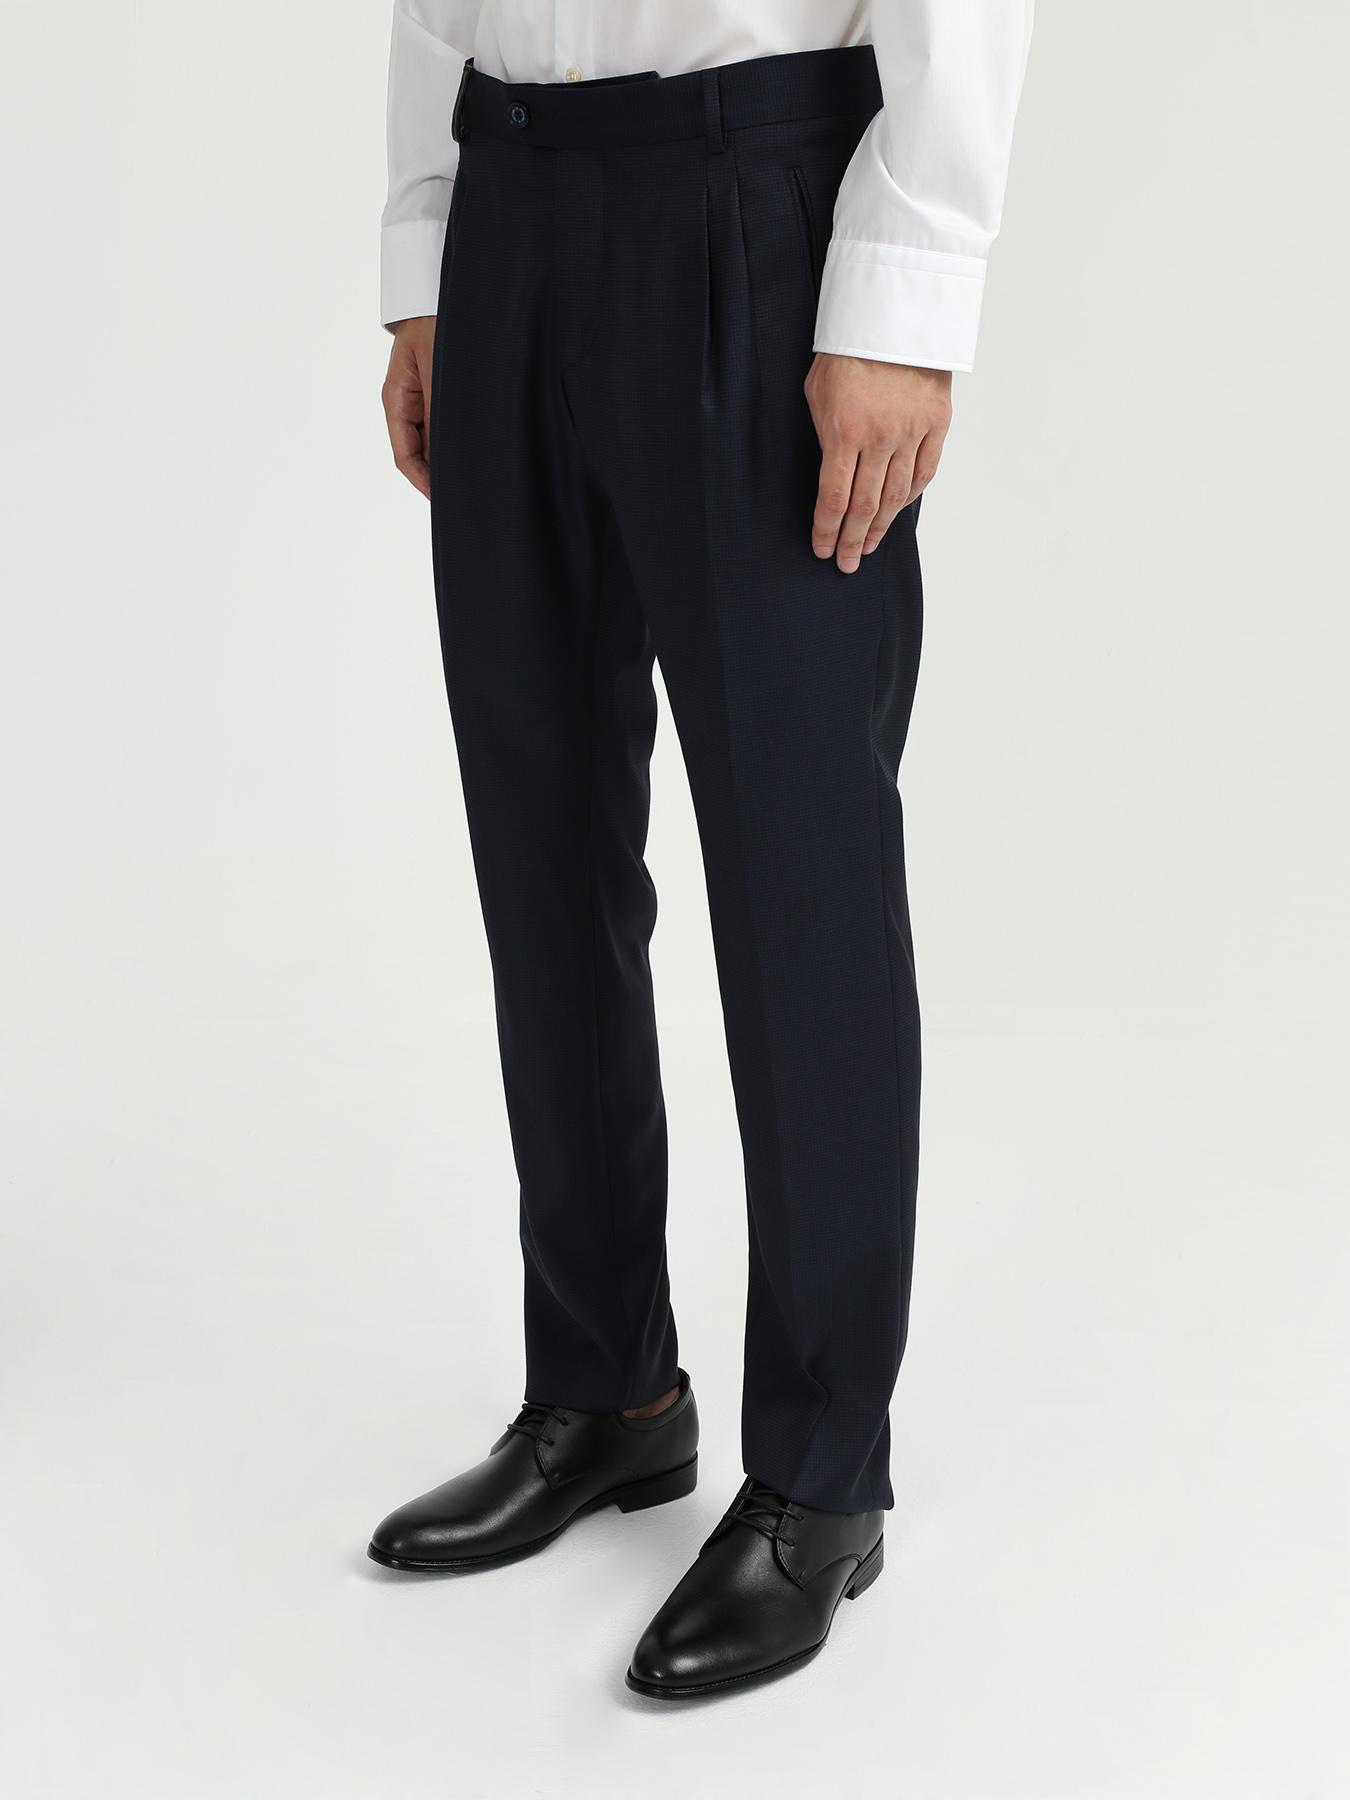 Брюки Finisterre Классические брюки